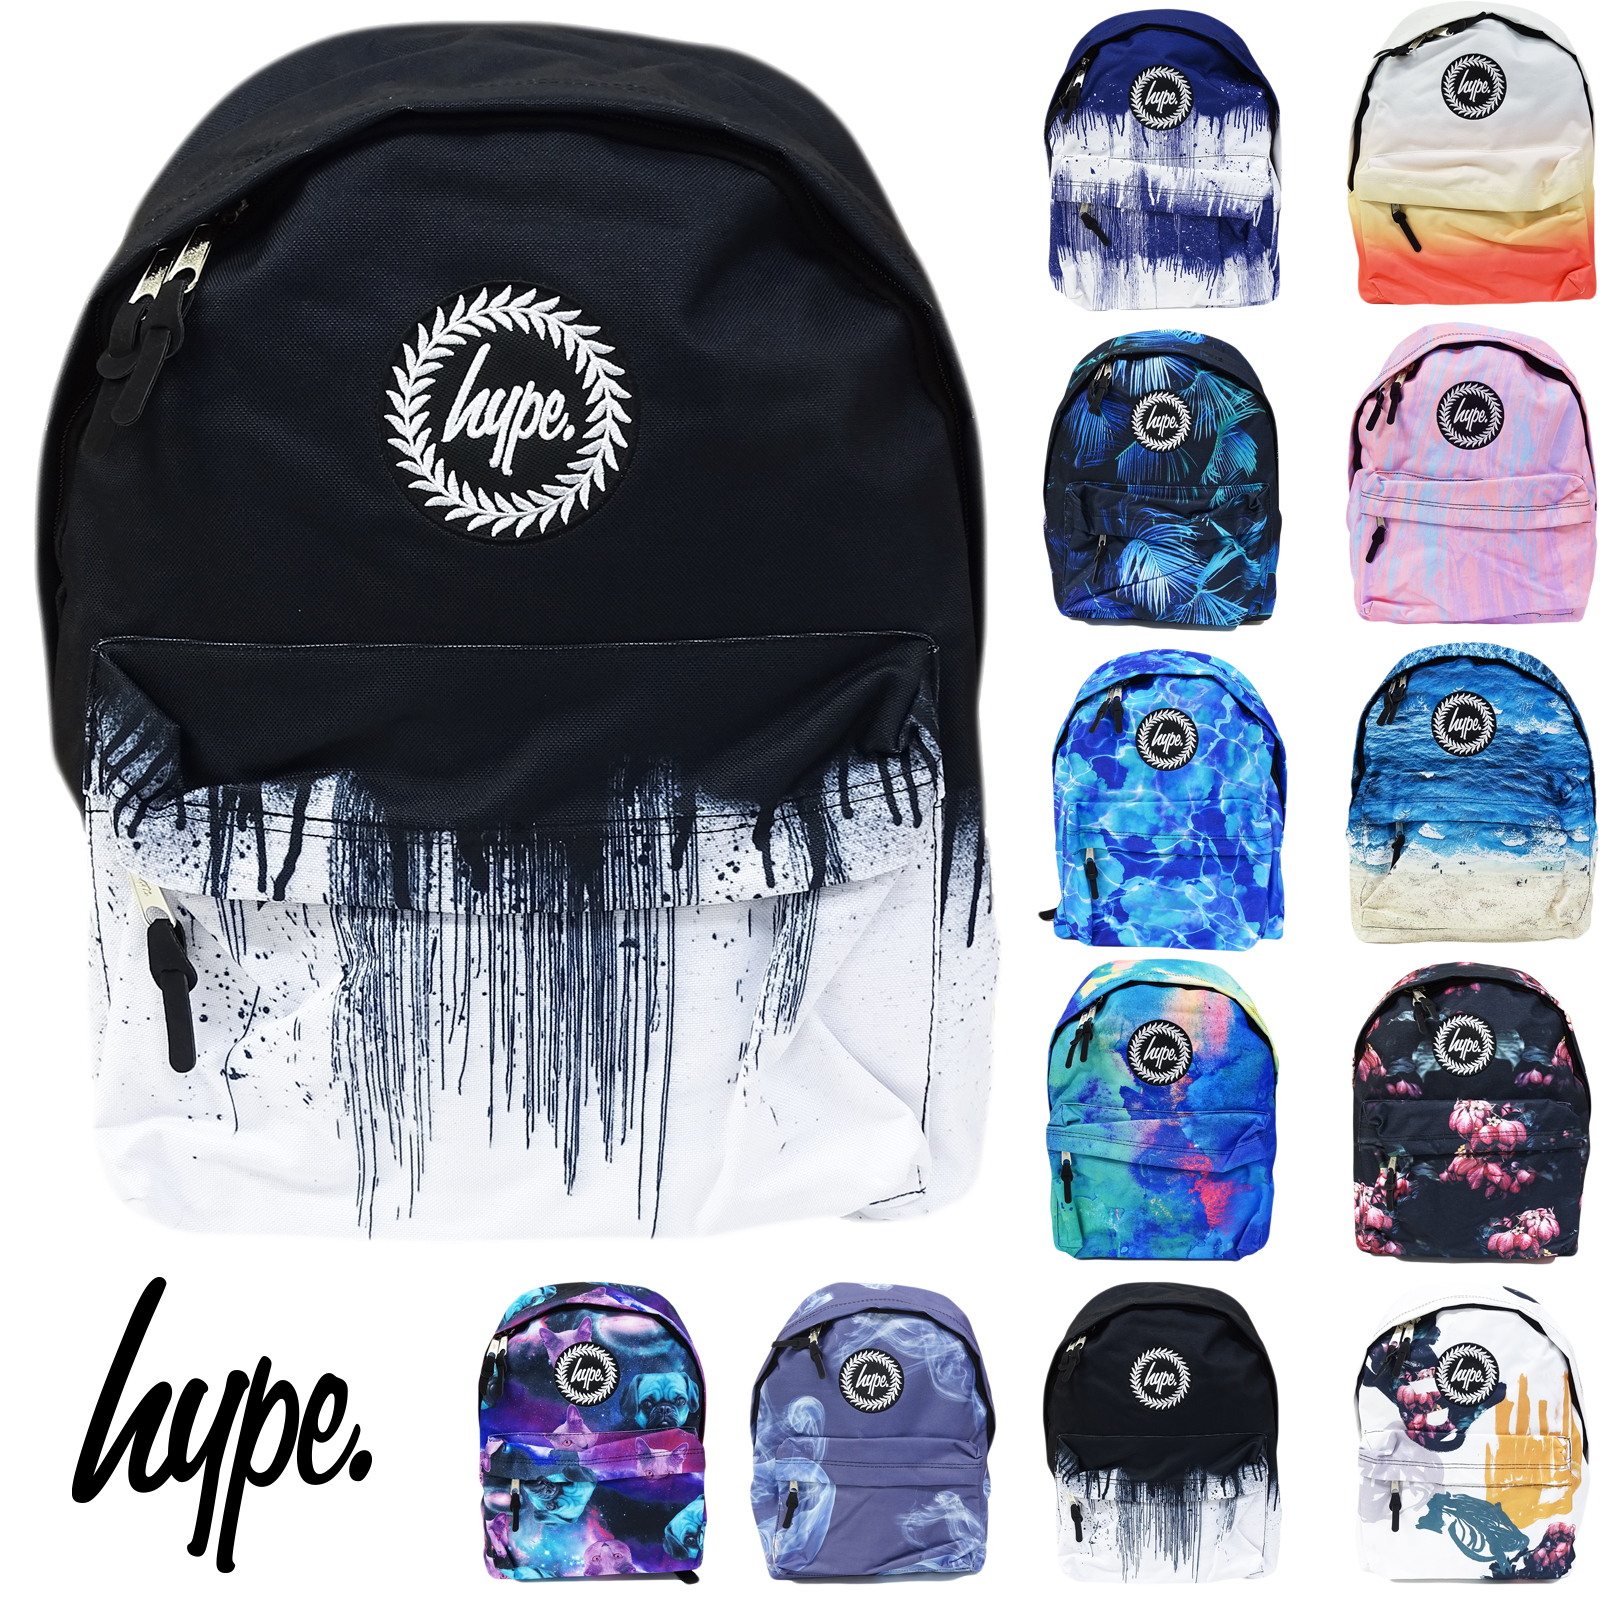 63f020a3e465 Sentinel Boys   Girls Hype Backpack Bags - HYPE BAG - School Rucksack